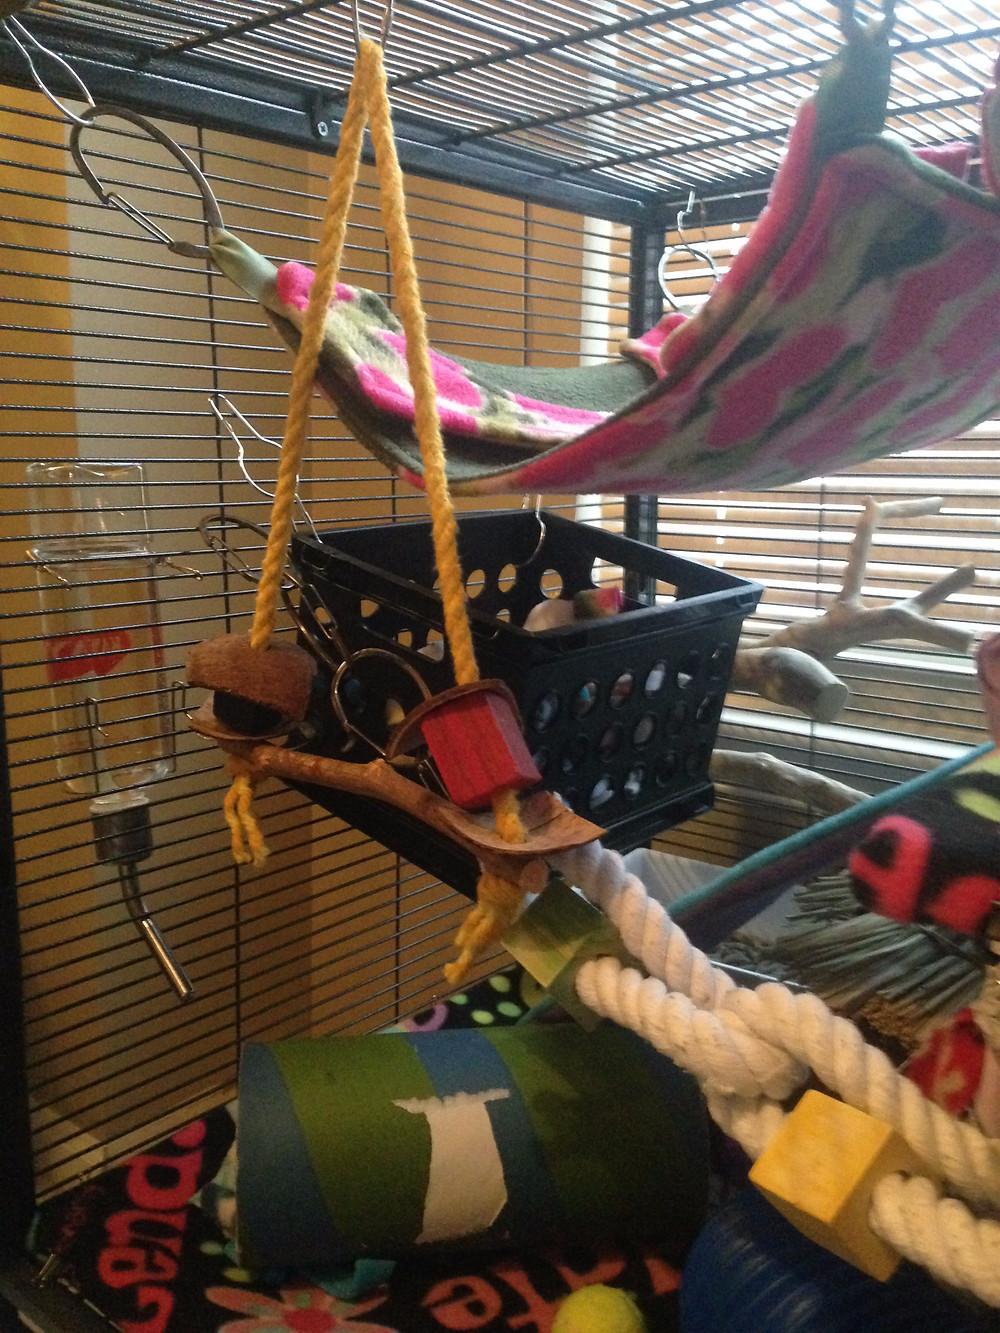 Fleece rat hammocks, a box with fleece scraps, rope, climbing tree, tunnel and water bottle.